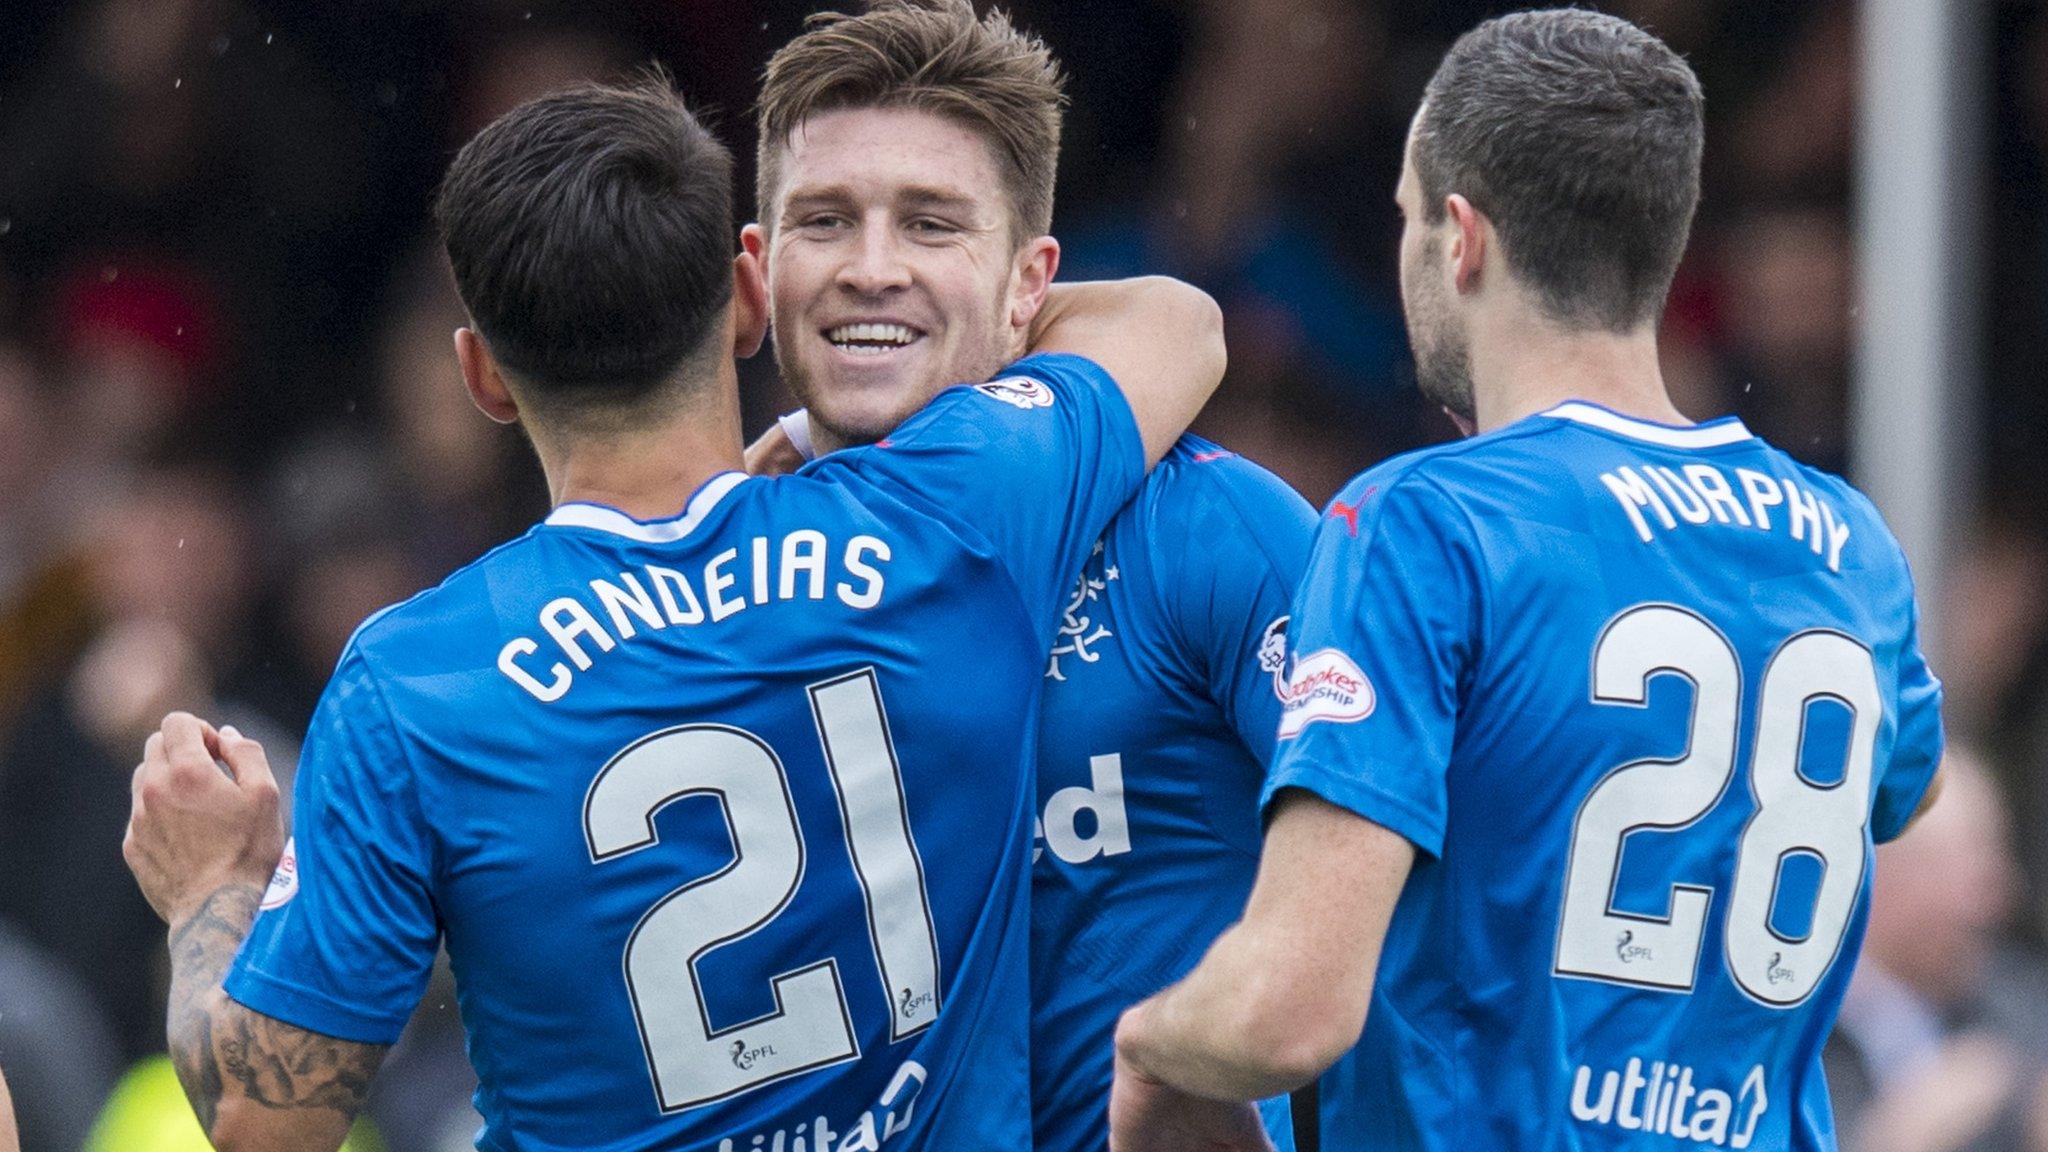 Rangers' Windass hits hat-trick in eight-goal thriller